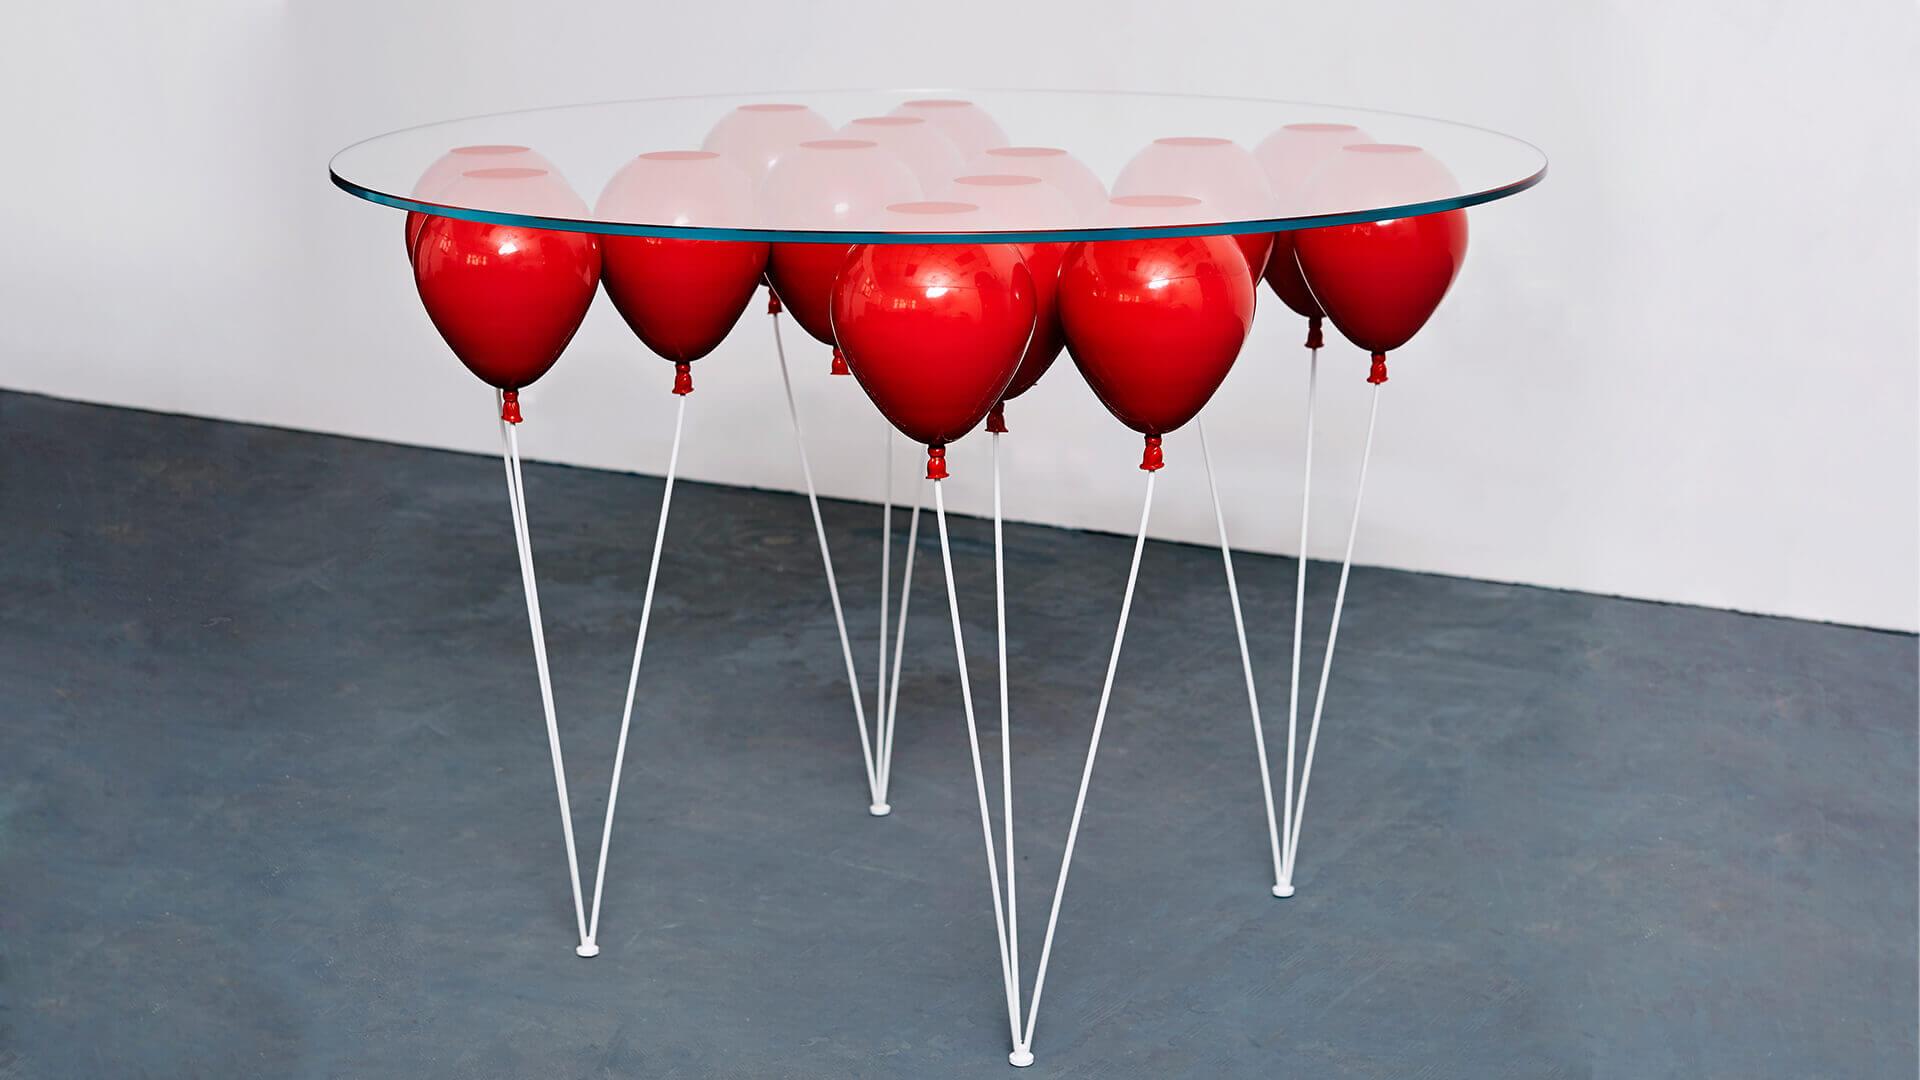 Balloon Dining Round_Carousel_05